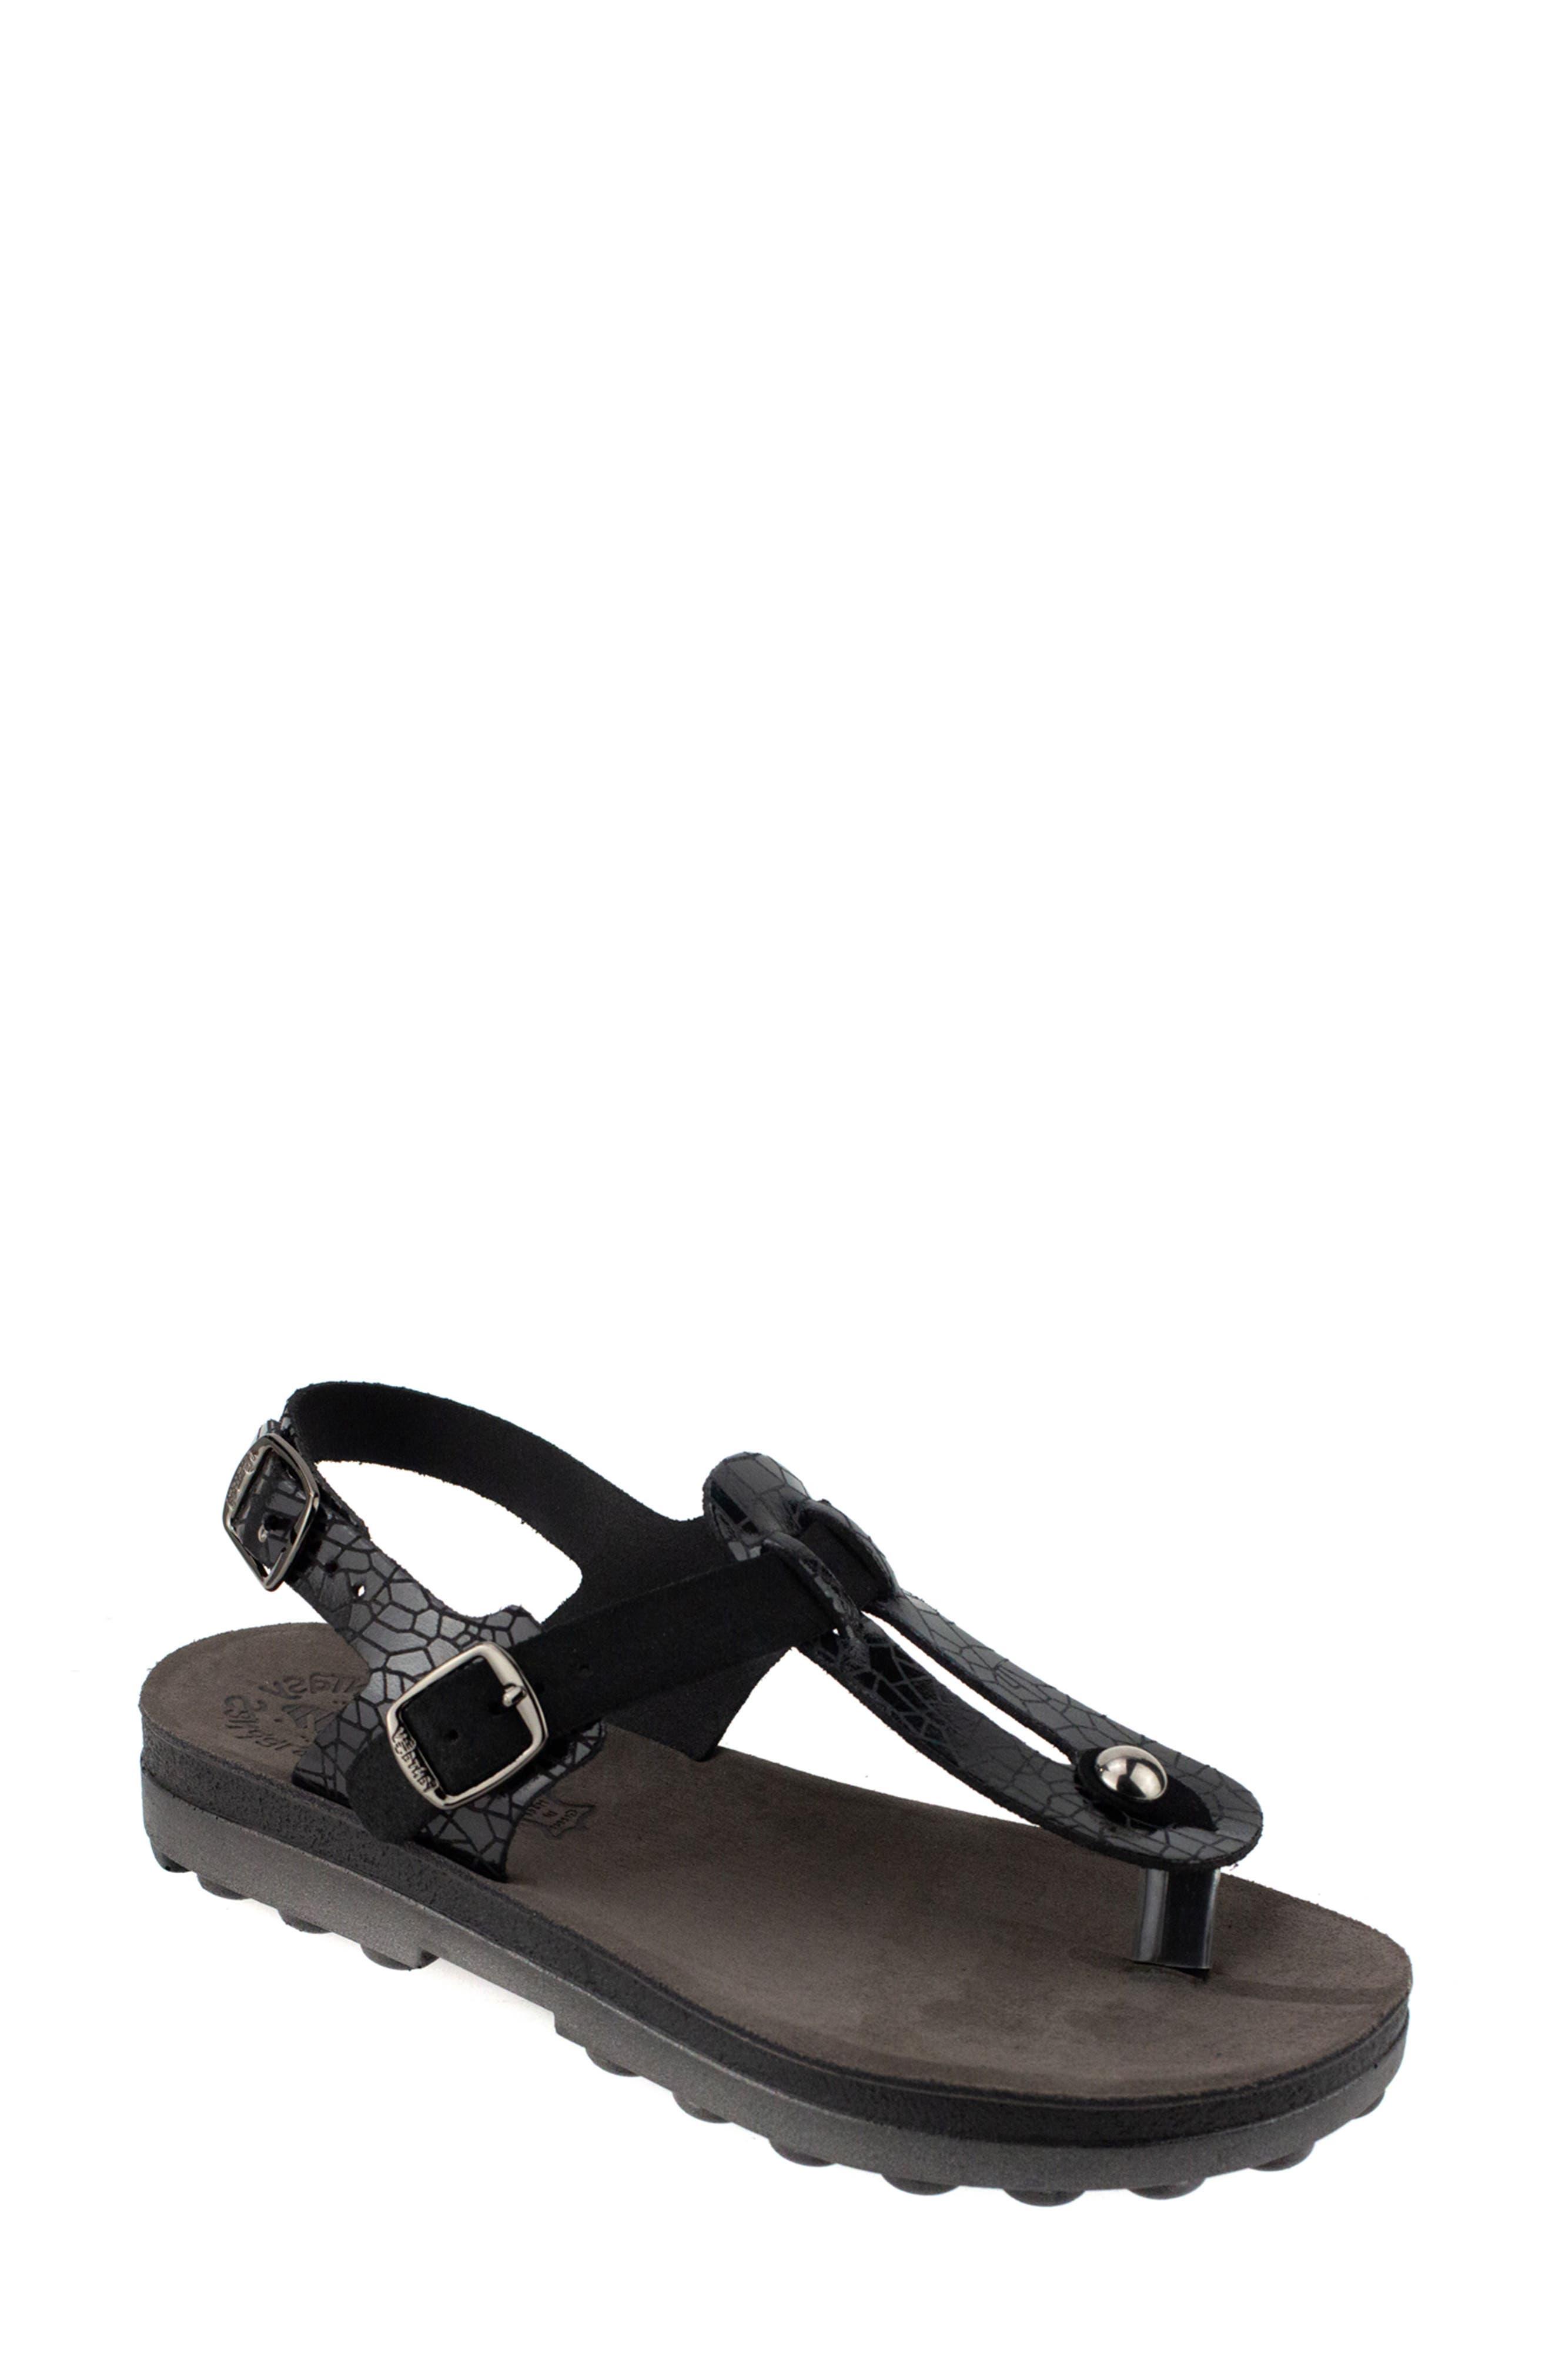 Marlena Slingback Sandal